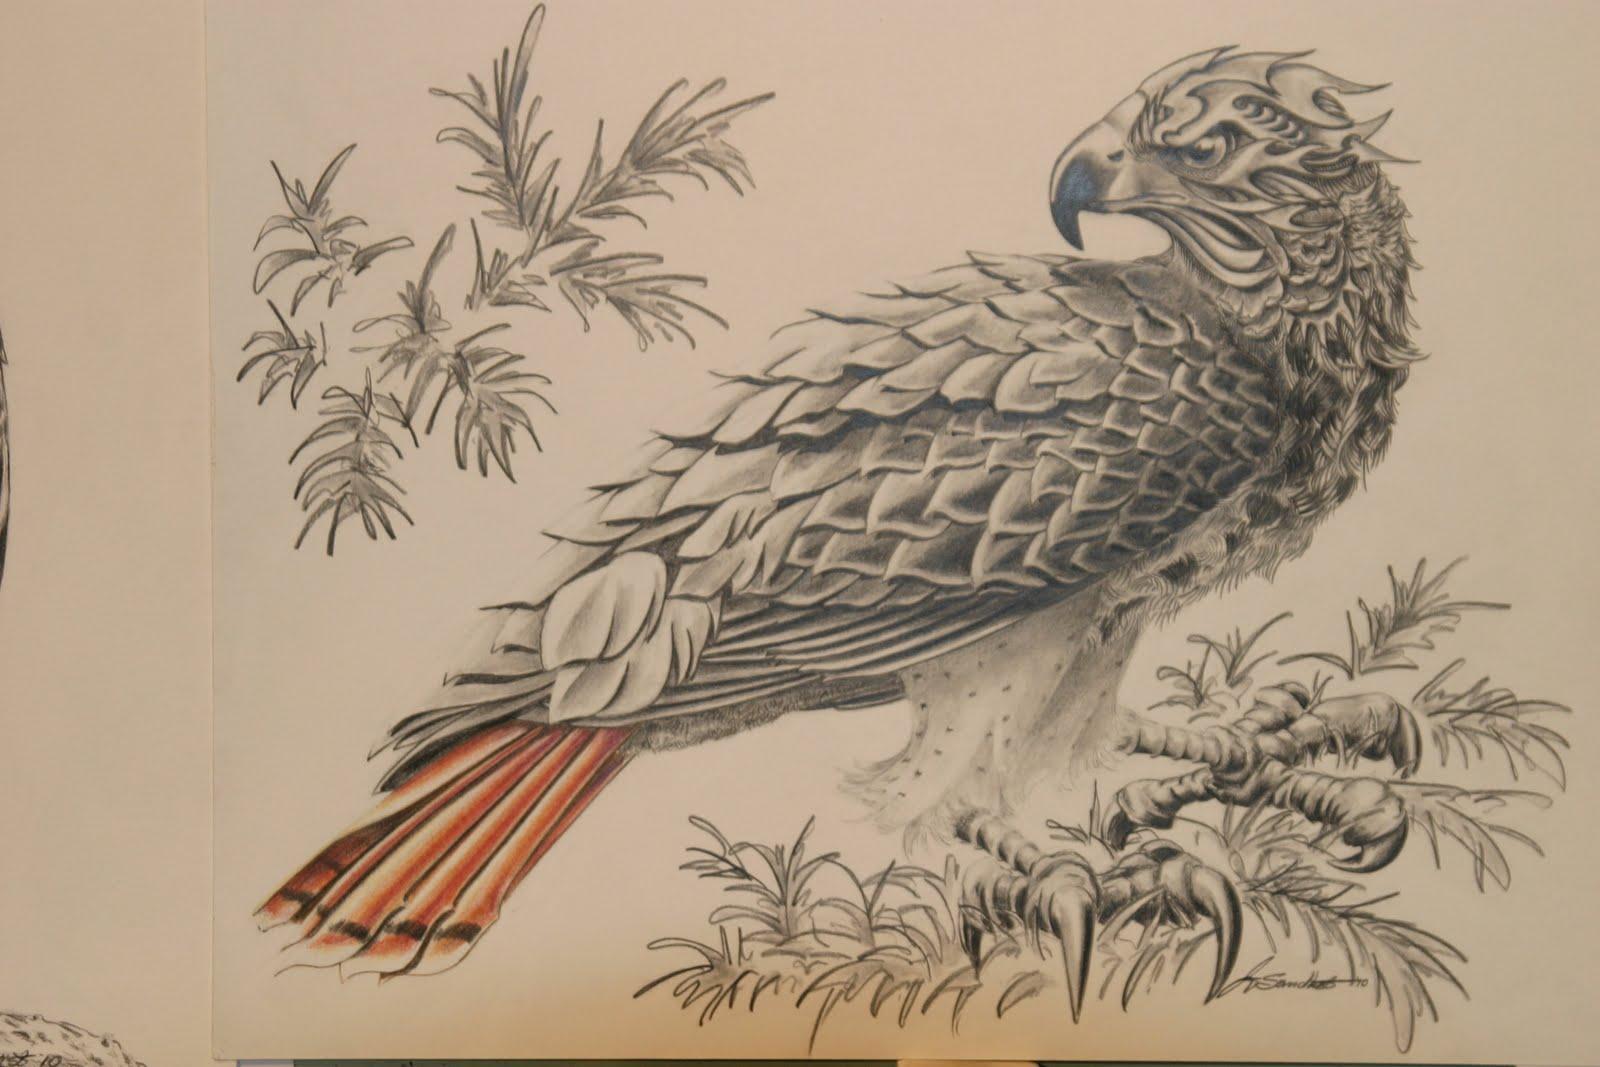 1600x1067 Geoff Sandhurst, Artist, Calgary, Alberta Red Tailed Hawk Drawing